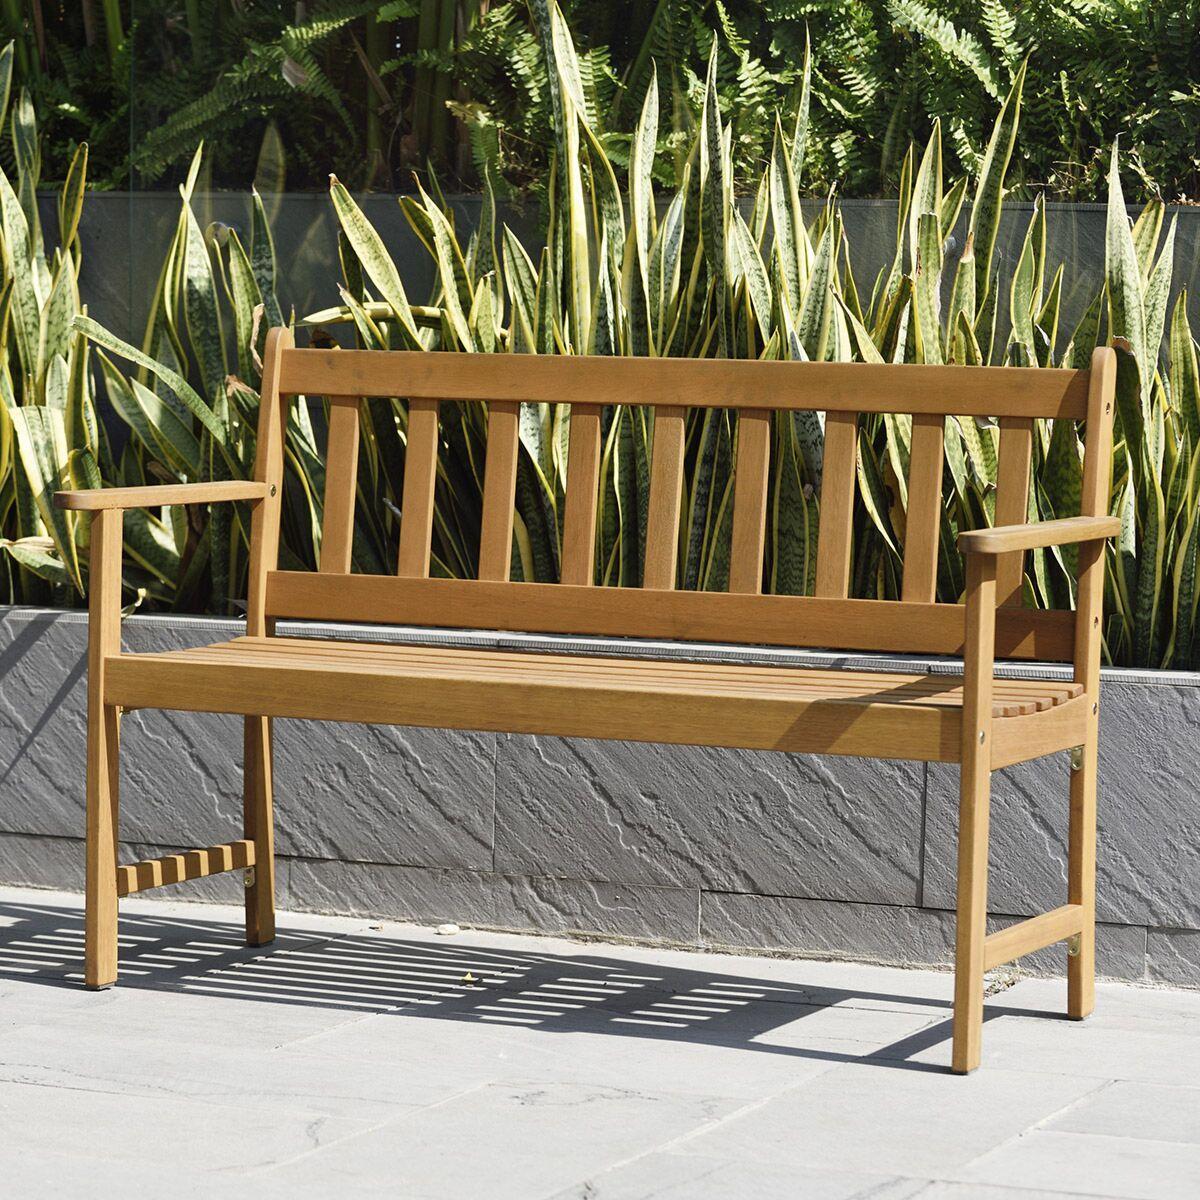 Lamu 2 Seater Eucalyptus FSC Wooden Bench - £59.99 with code @ Robert Dyas